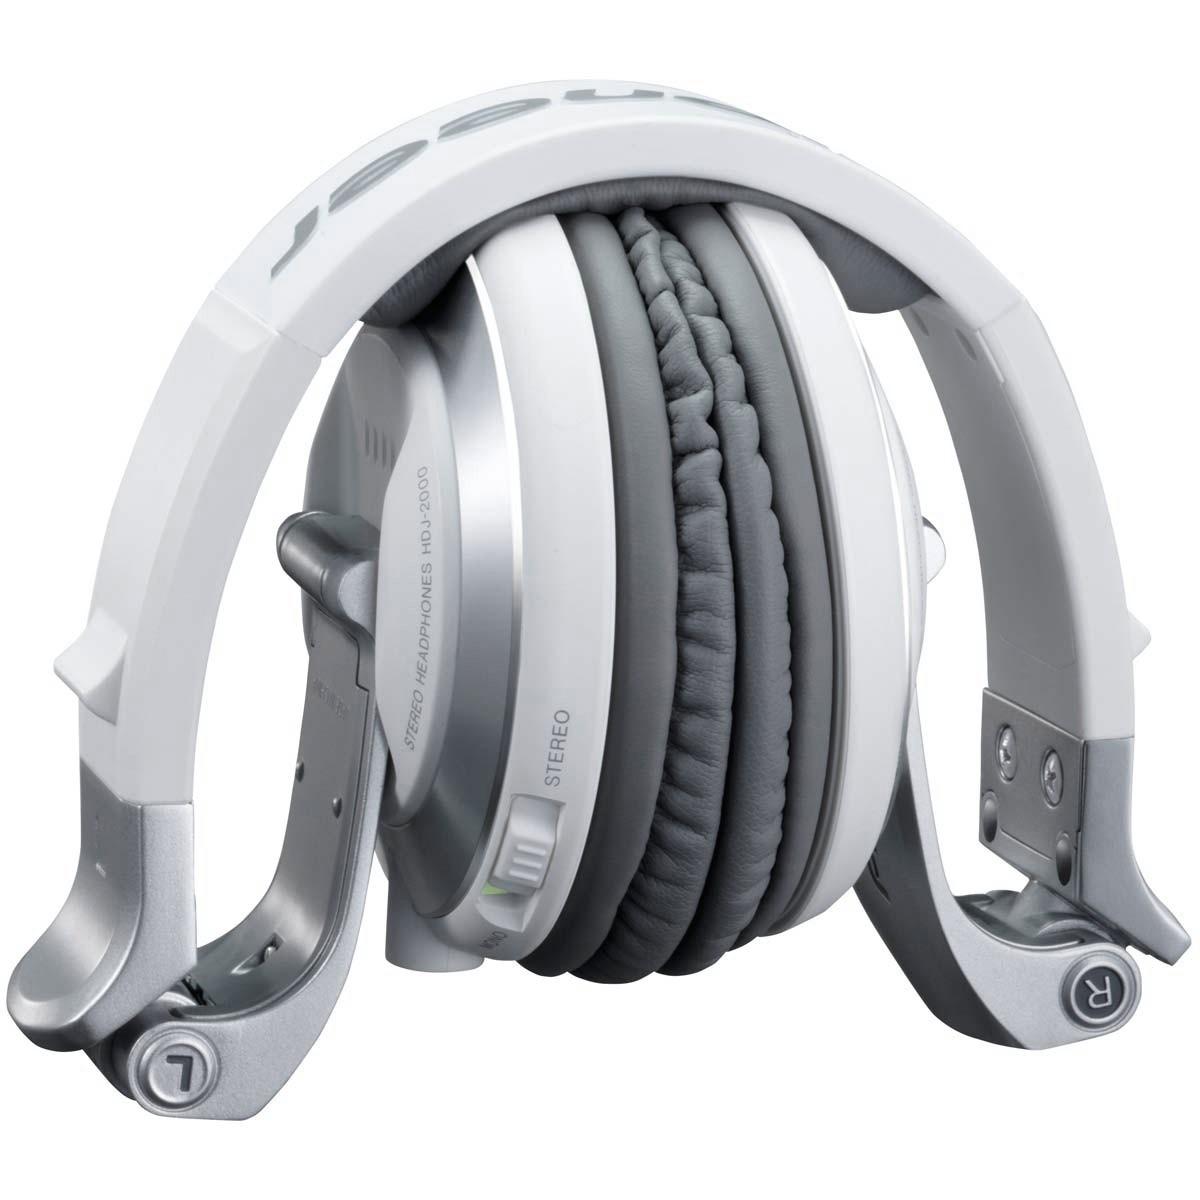 HDJ2000 - Fone de Ouvido Over-ear Branco HDJ 2000 - Pioneer